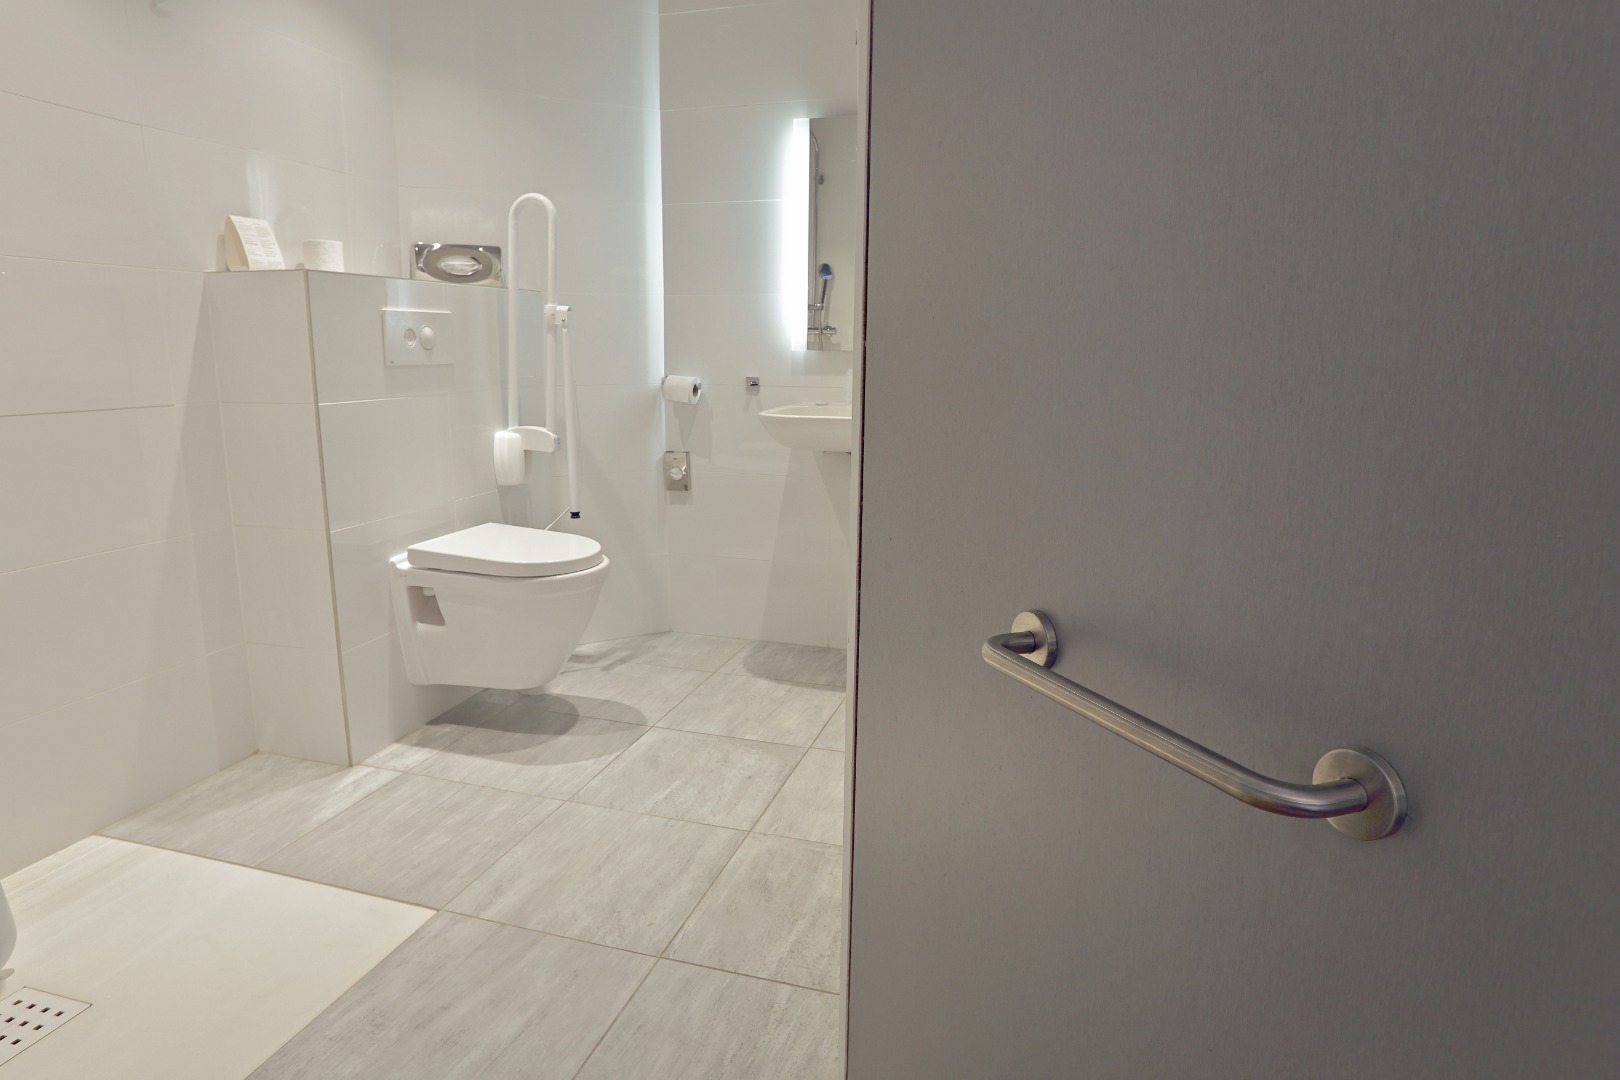 Comment Installer Toilette Suspendu comment installer un wc suspendu avec bati support ?